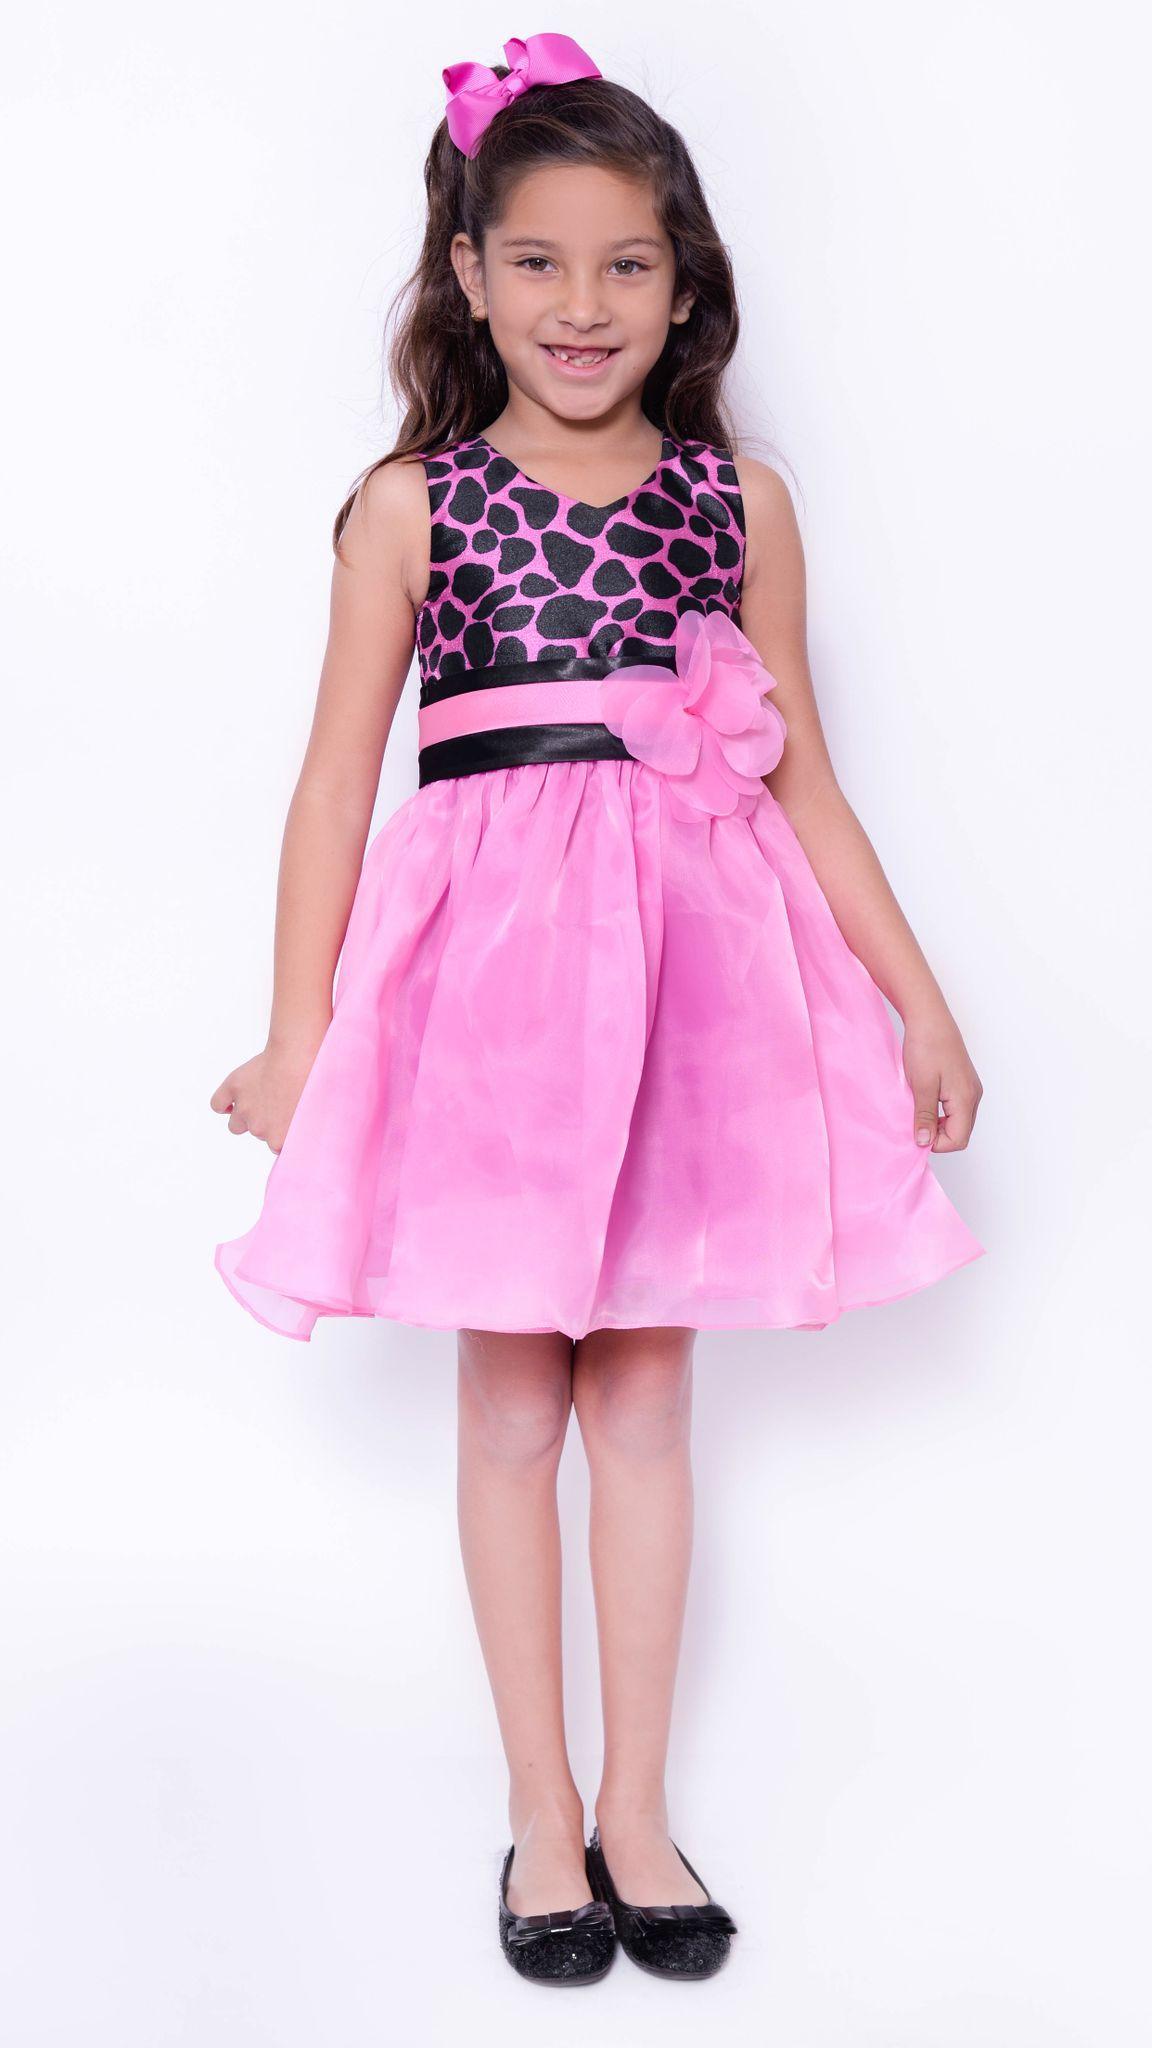 Cheetah print sleeveless party dress toddler girl